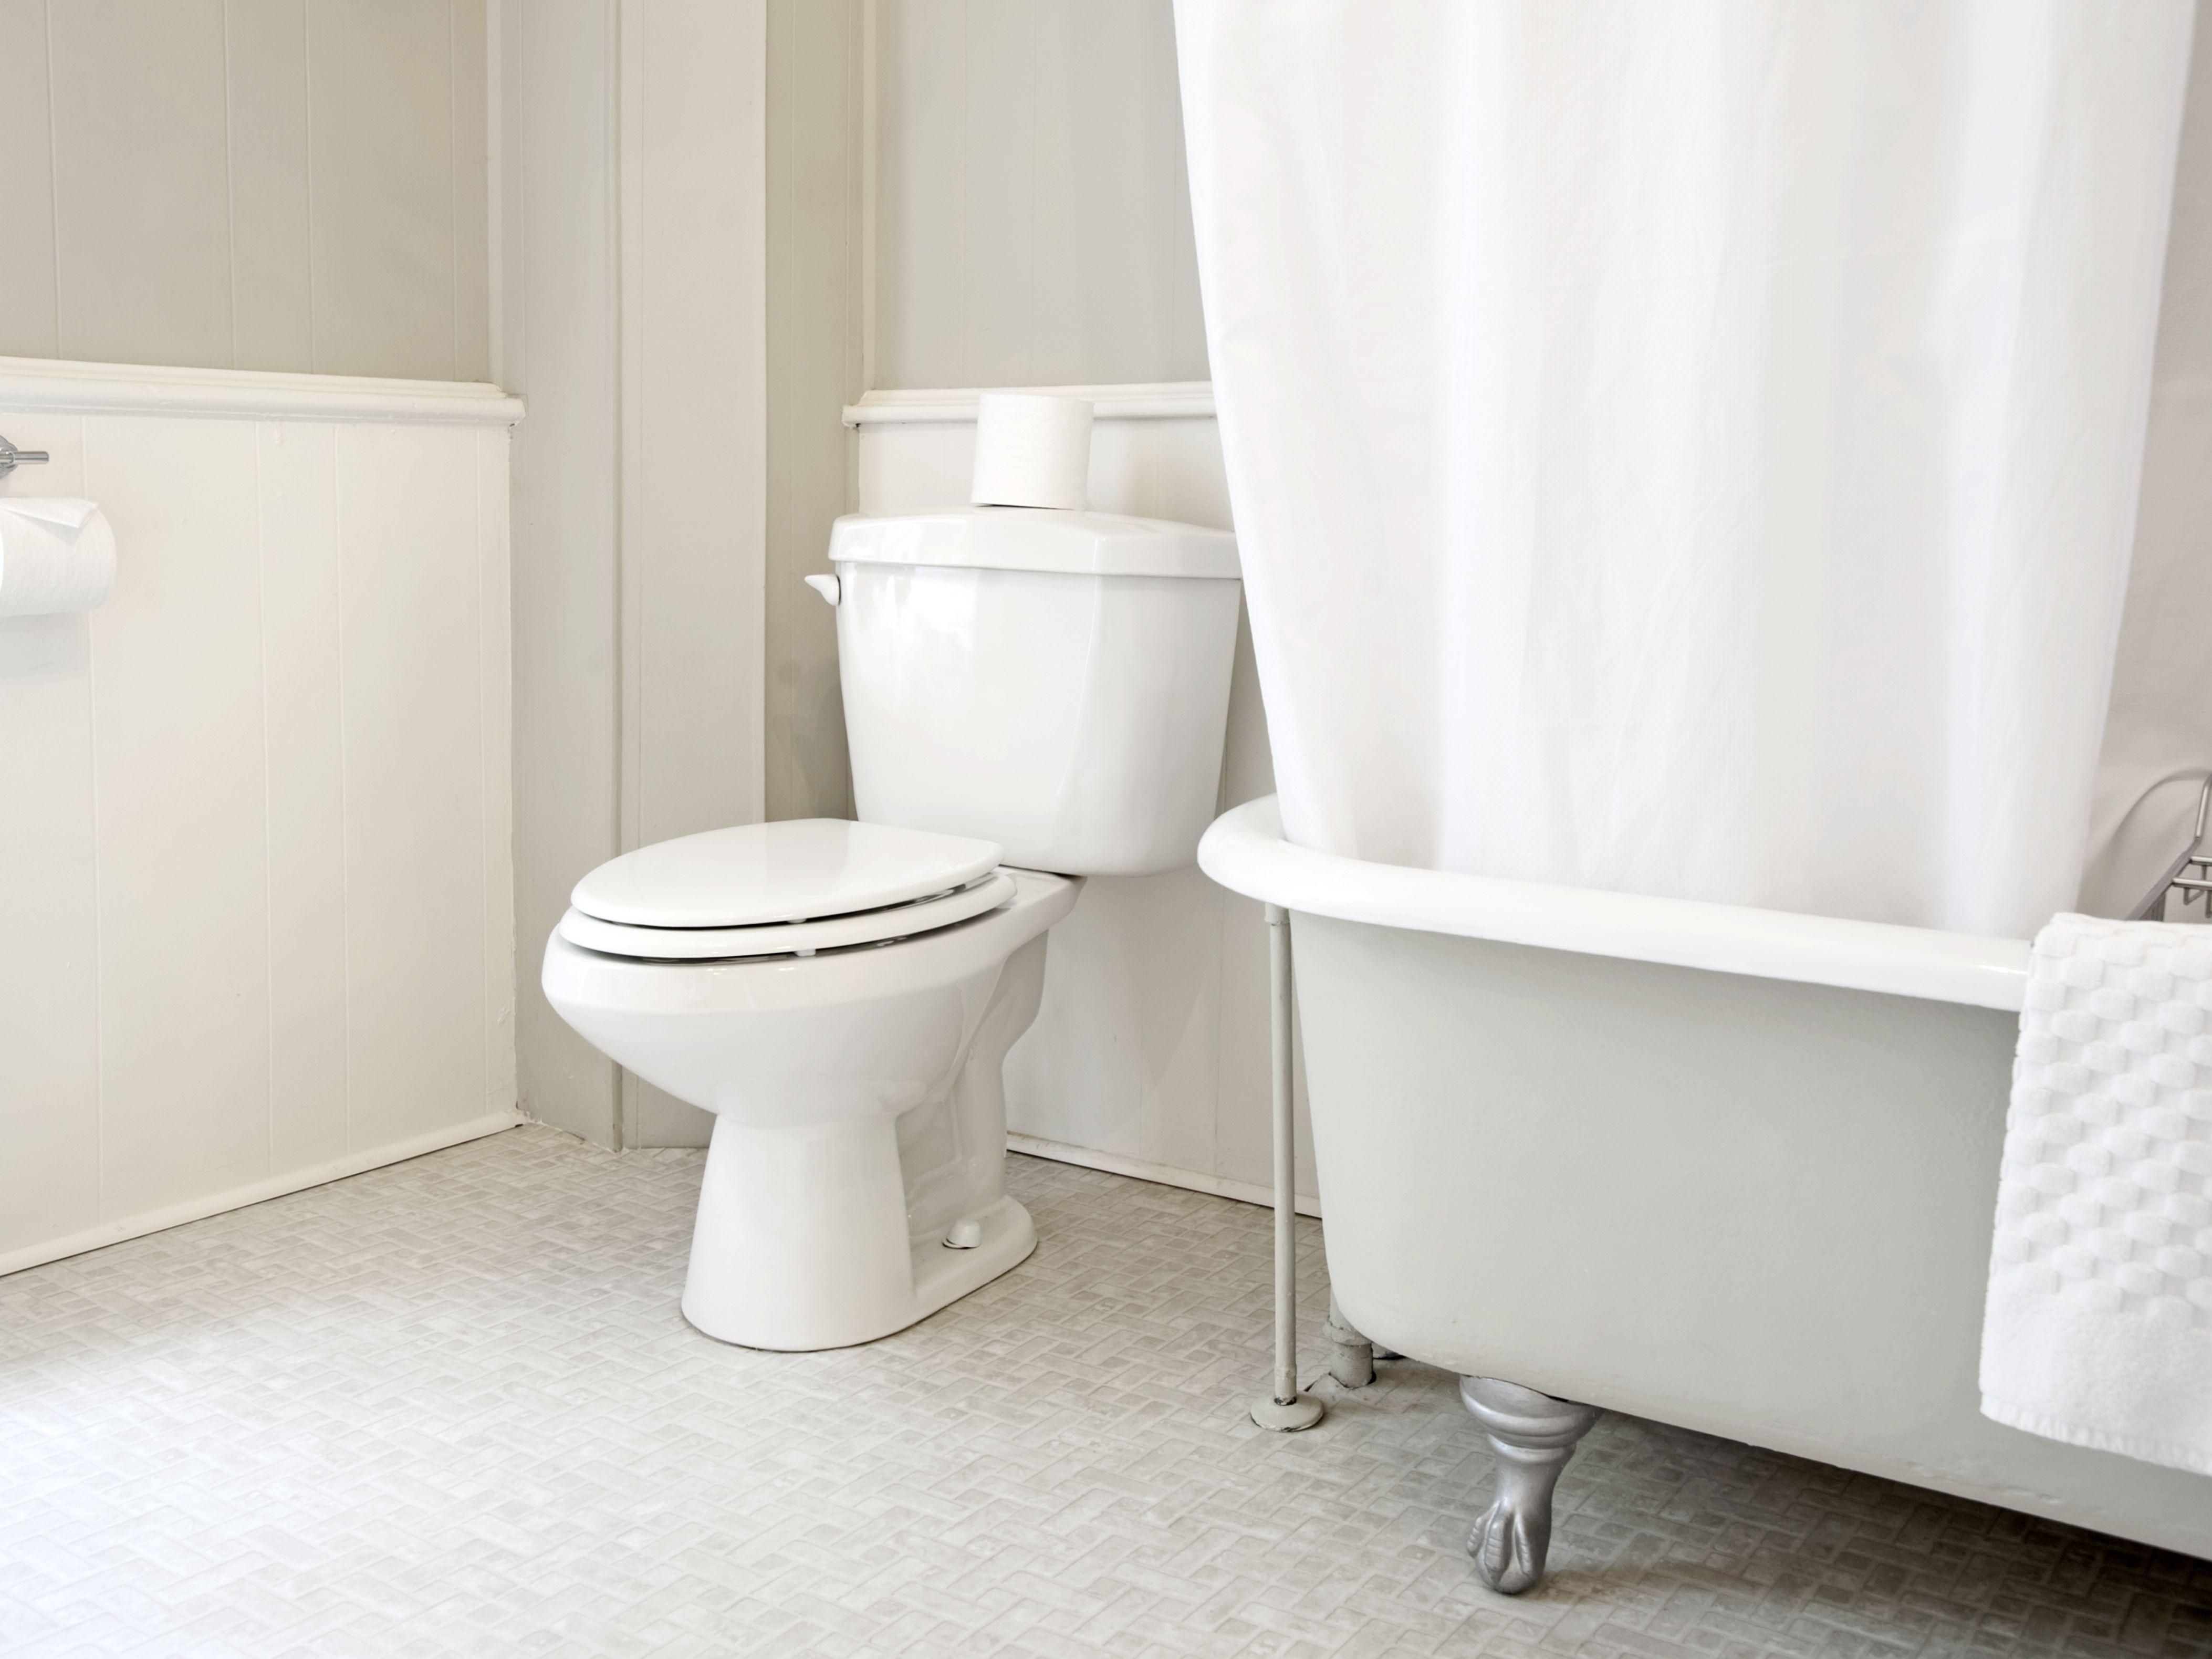 Tightening A Loose Toilet Seat